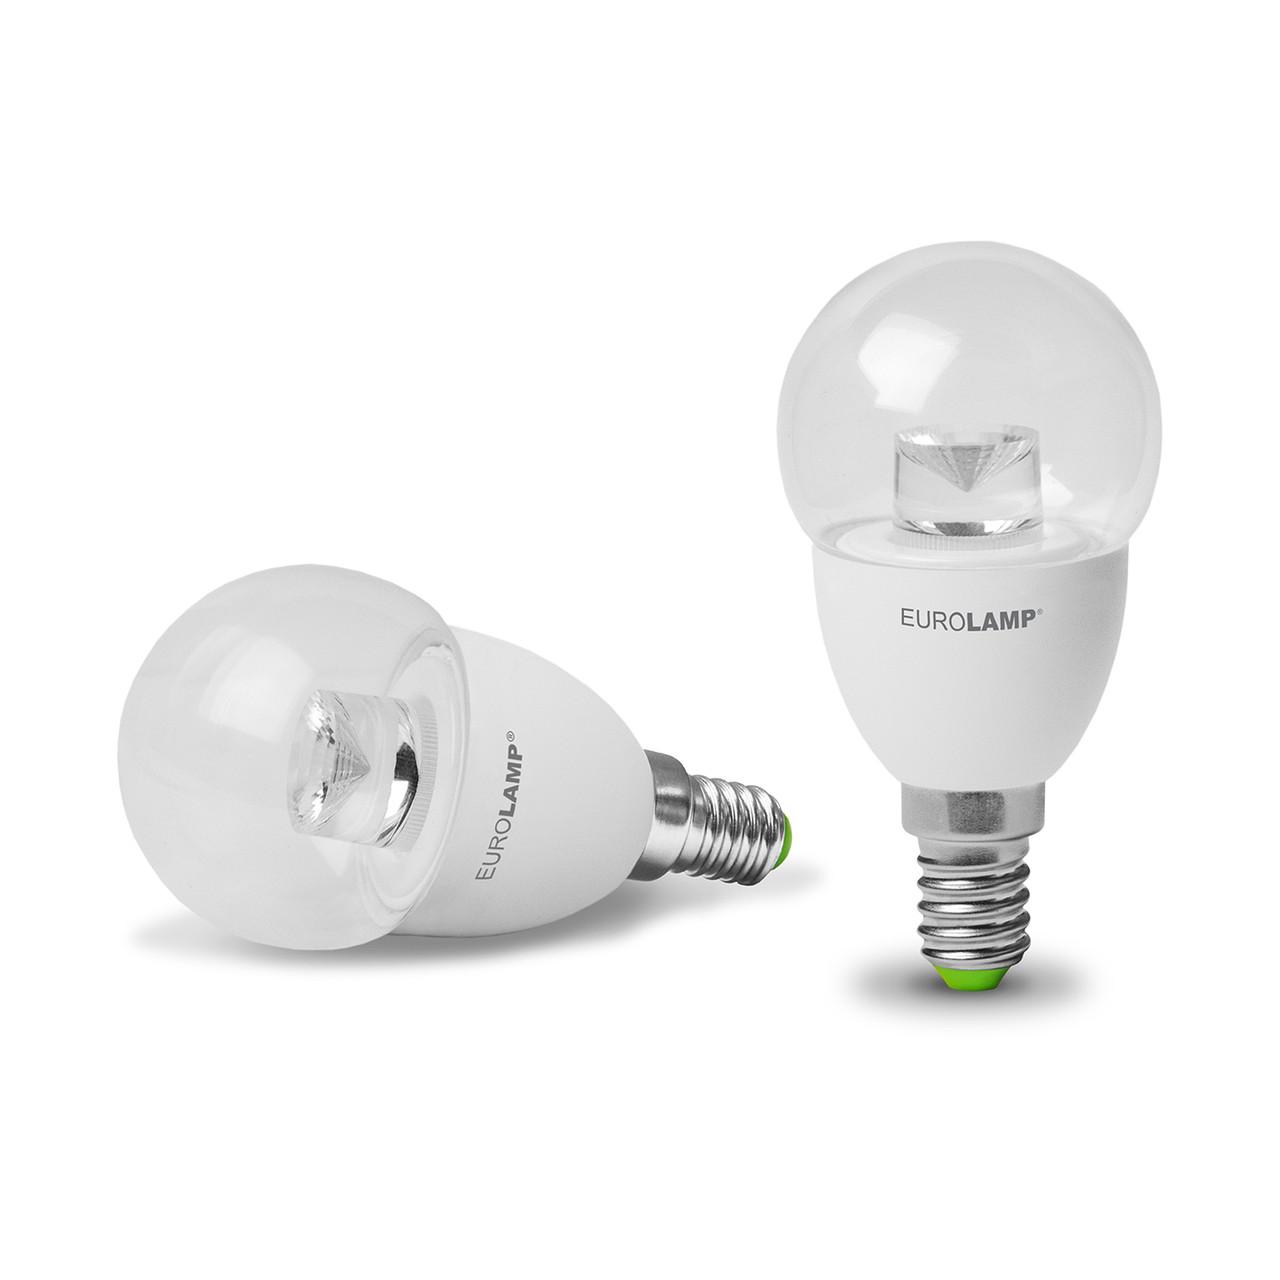 "EUROLAMP LED Лампа ЕКО серия ""D"" G45 5W прозрачная"